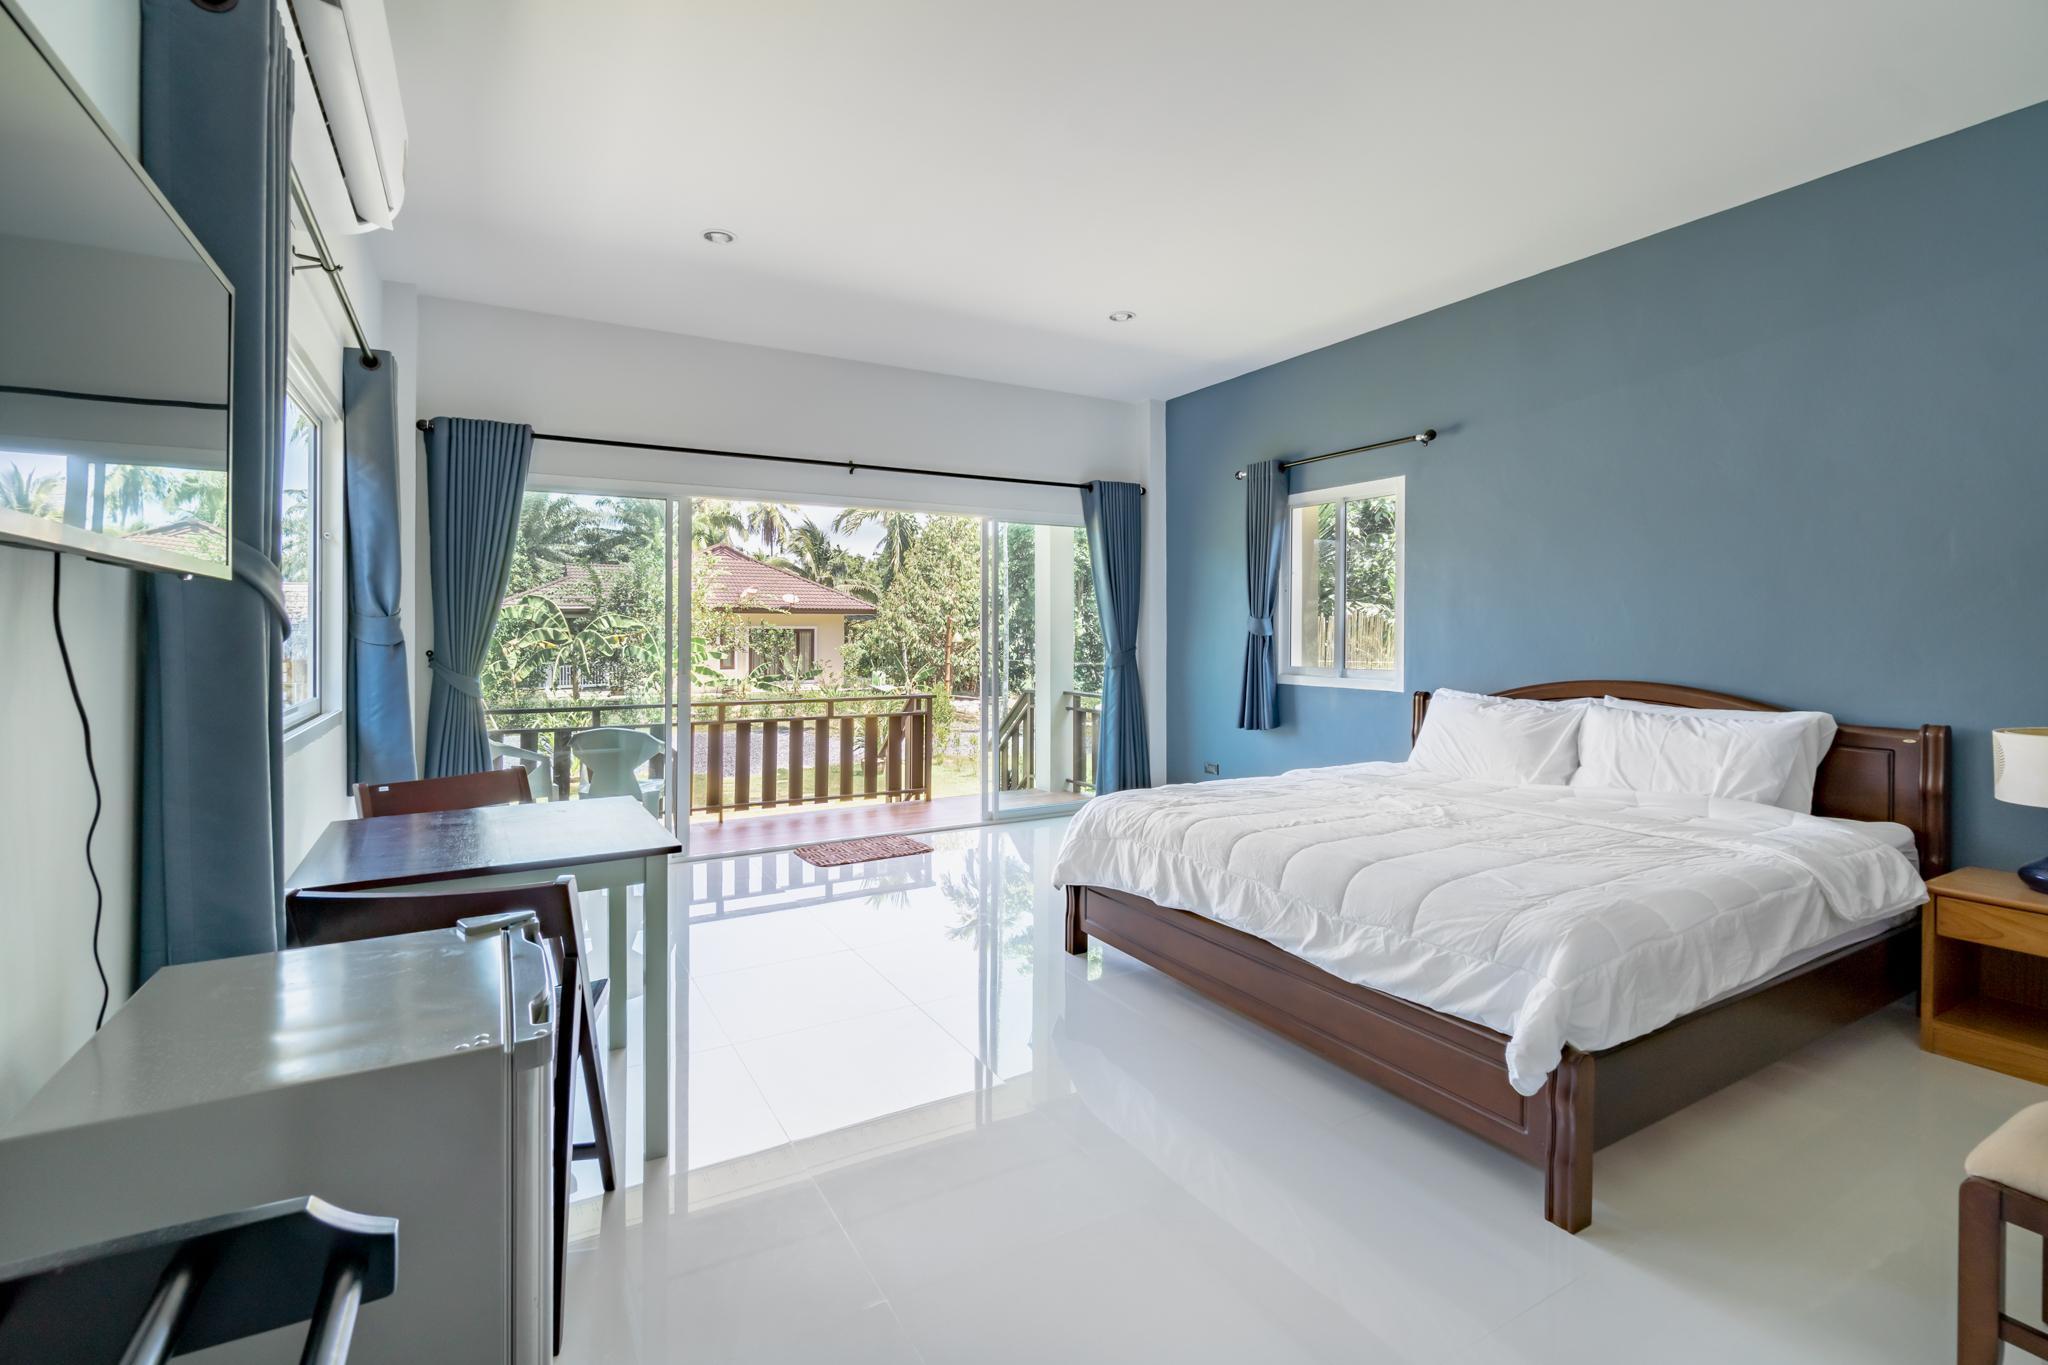 Lay Back Villa Papaya Villa บังกะโล 1 ห้องนอน 1 ห้องน้ำส่วนตัว ขนาด 60 ตร.ม. – นพรัตน์ธารา